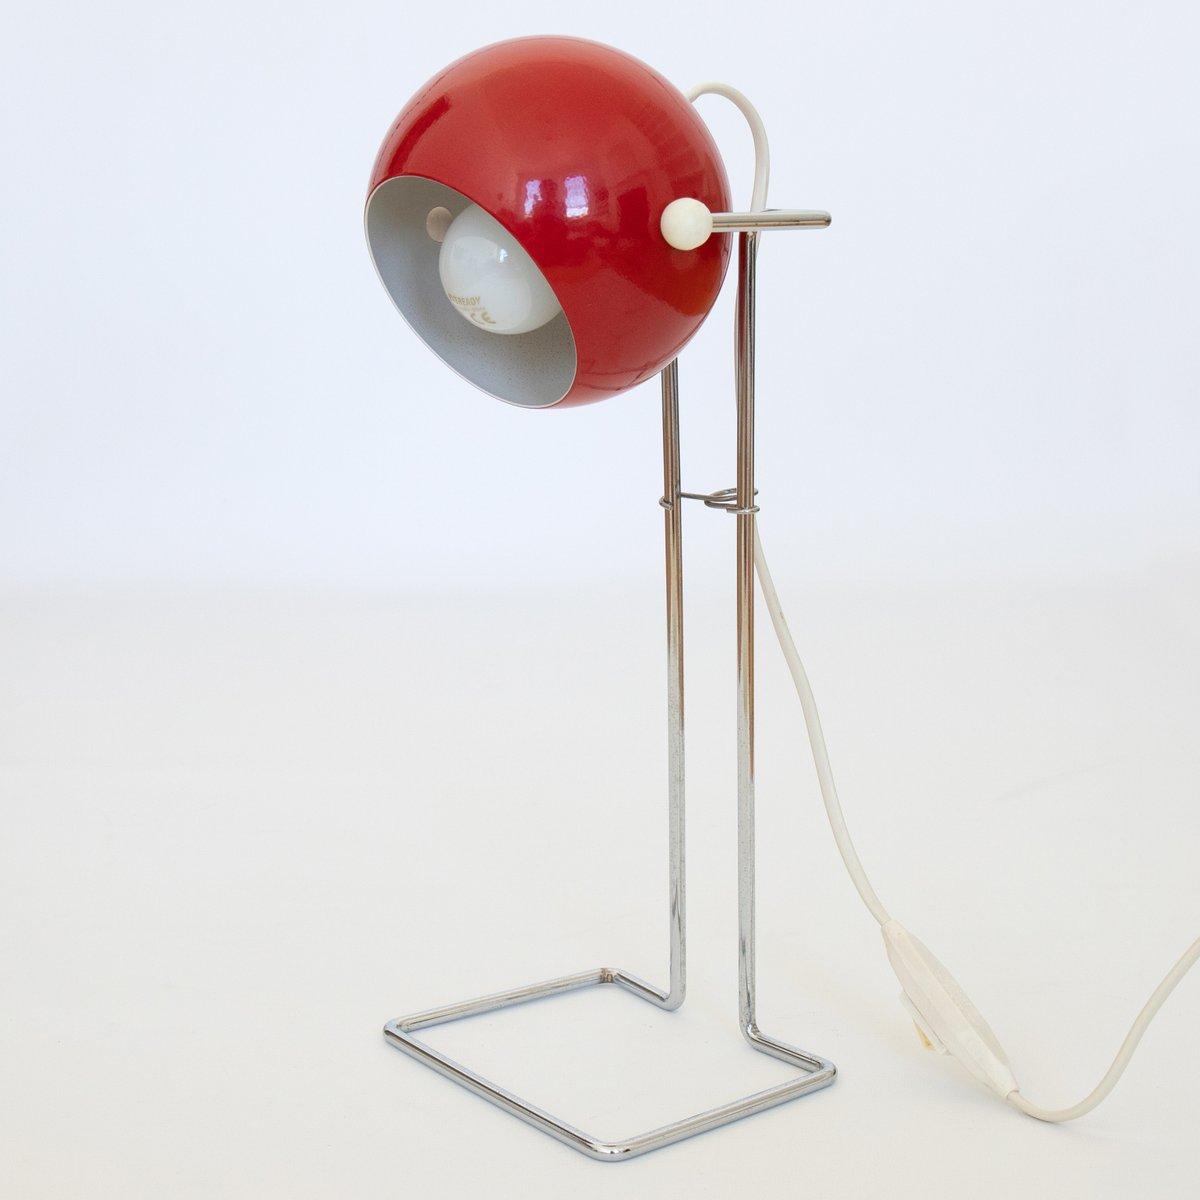 Danish Pop Art Bubble Lamp In Red By P Bosque For Abo Randers 1970s Miniso Golf Desk